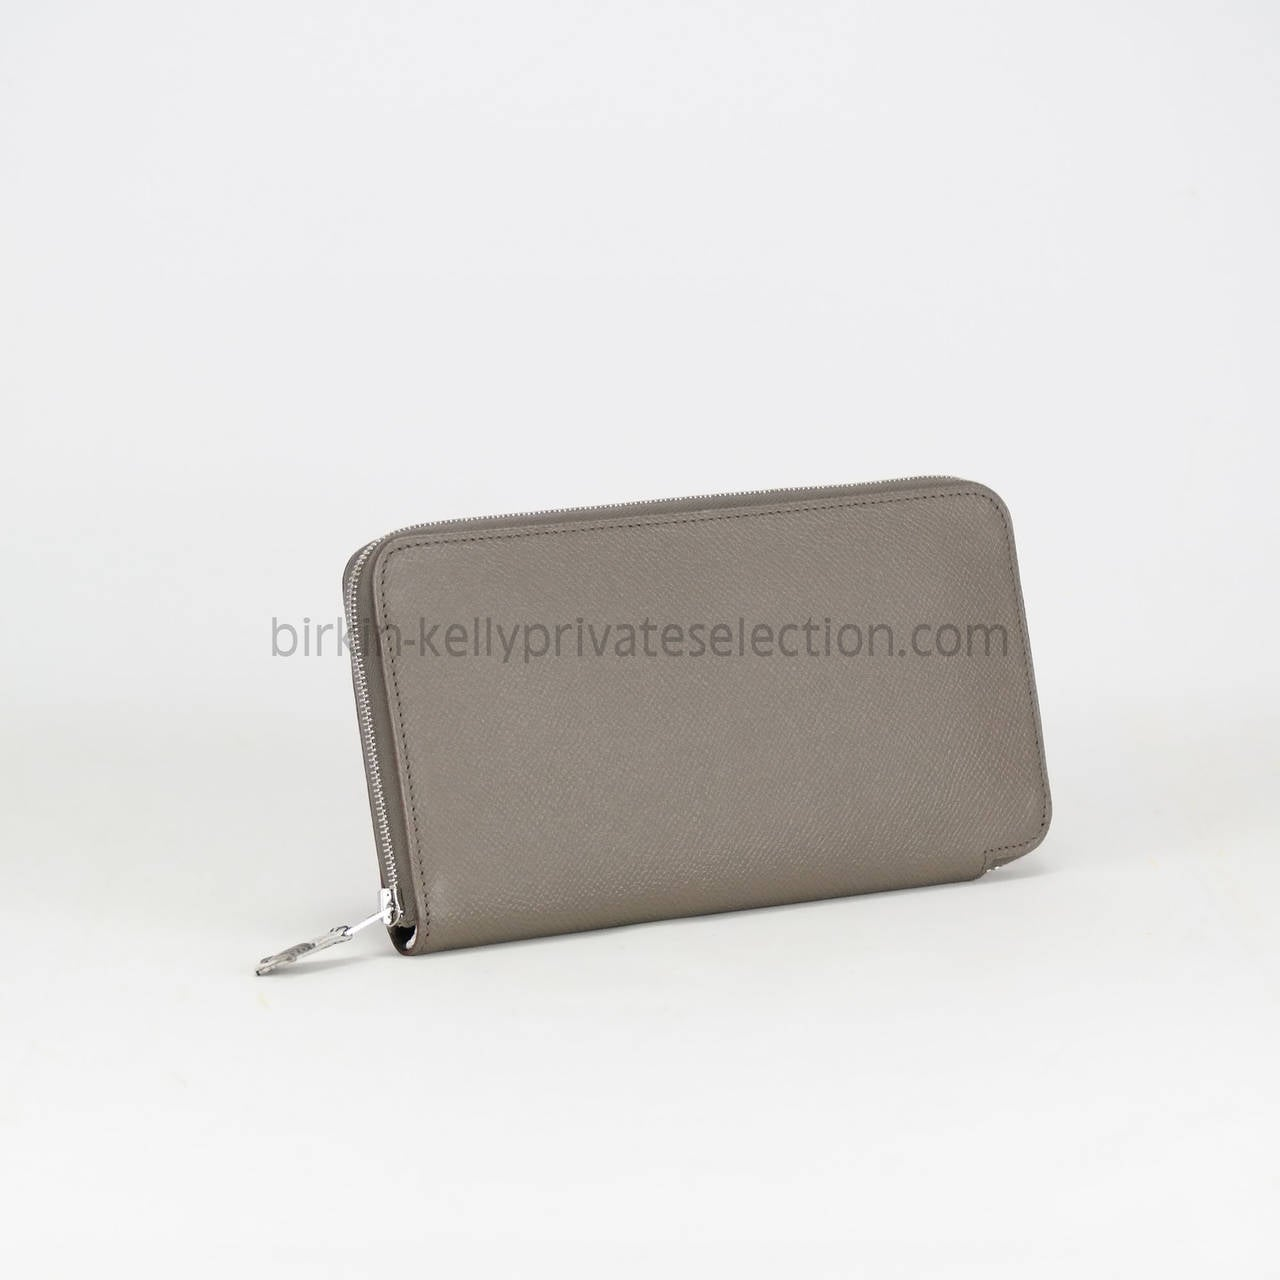 birkin alligator bag price - hermes Berline Sport vermilion/pearl gray